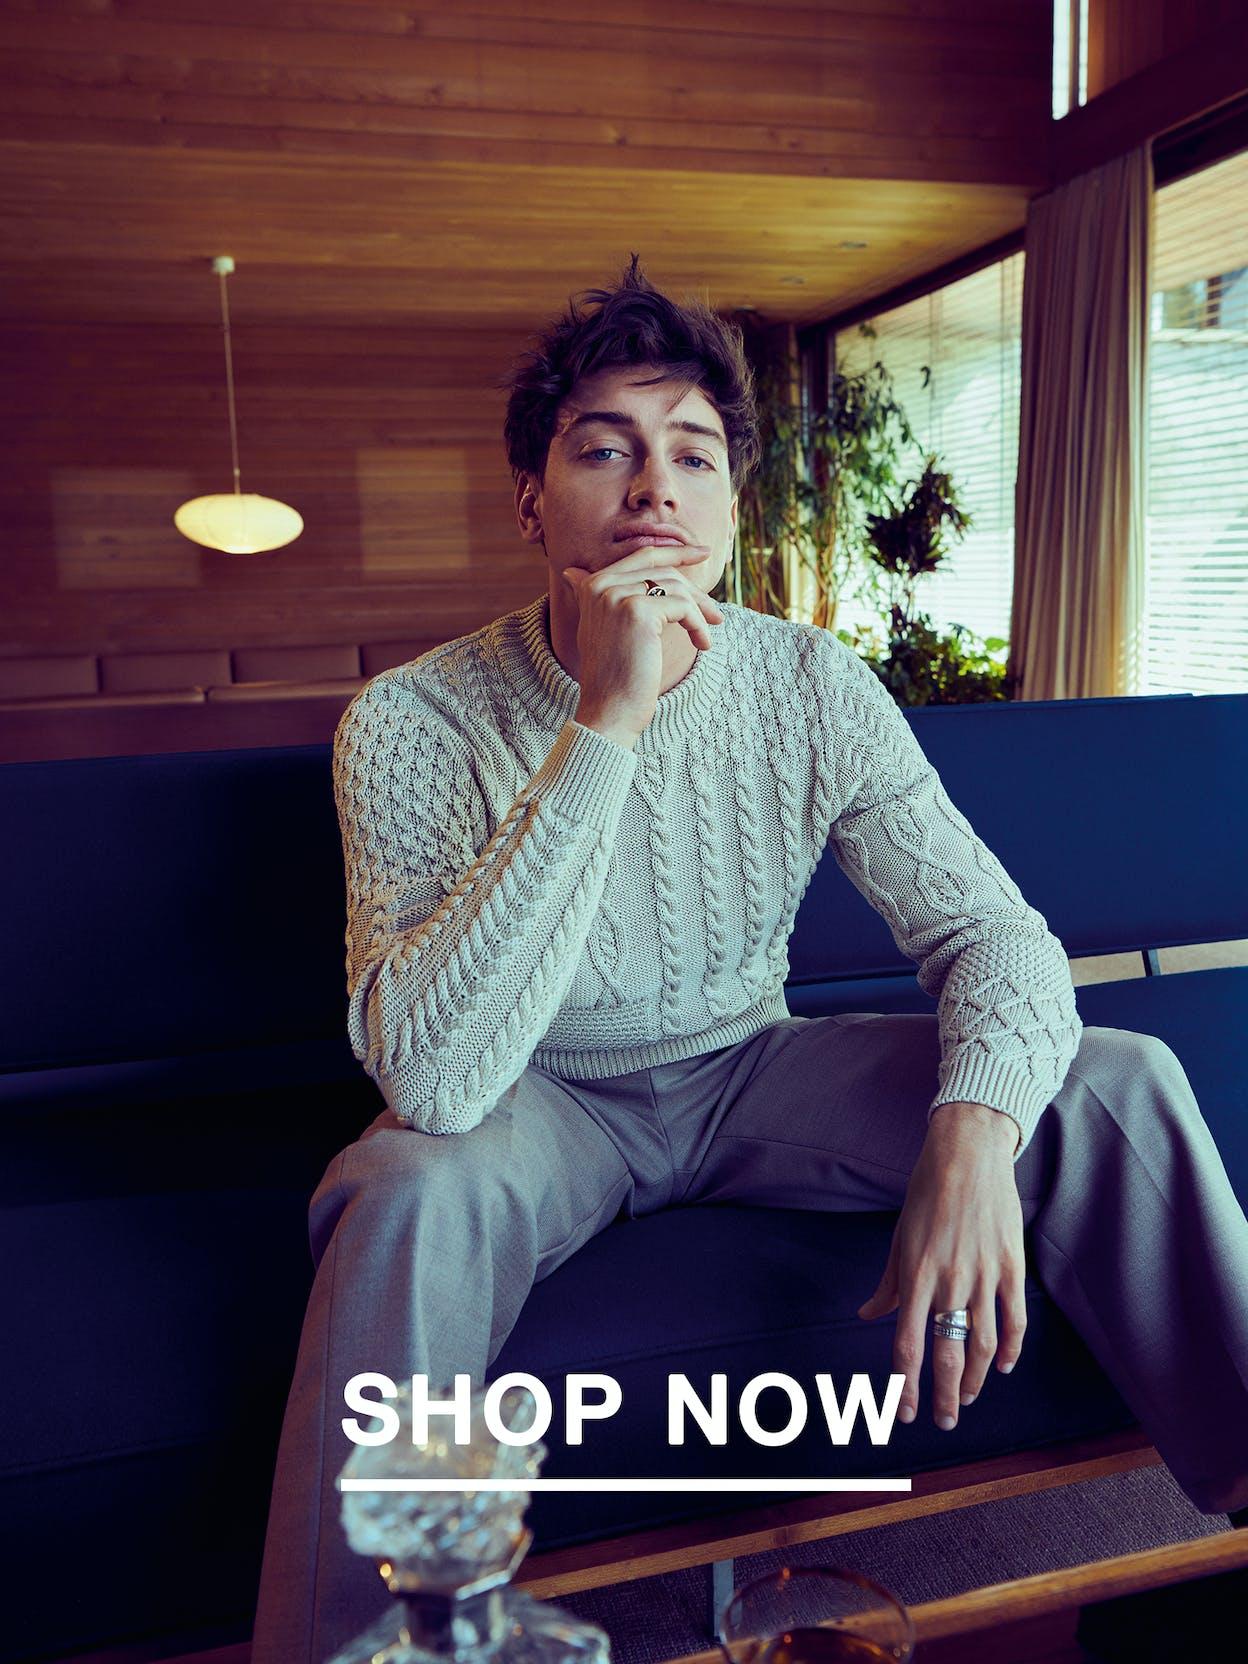 man-sit-sofa-knitwear